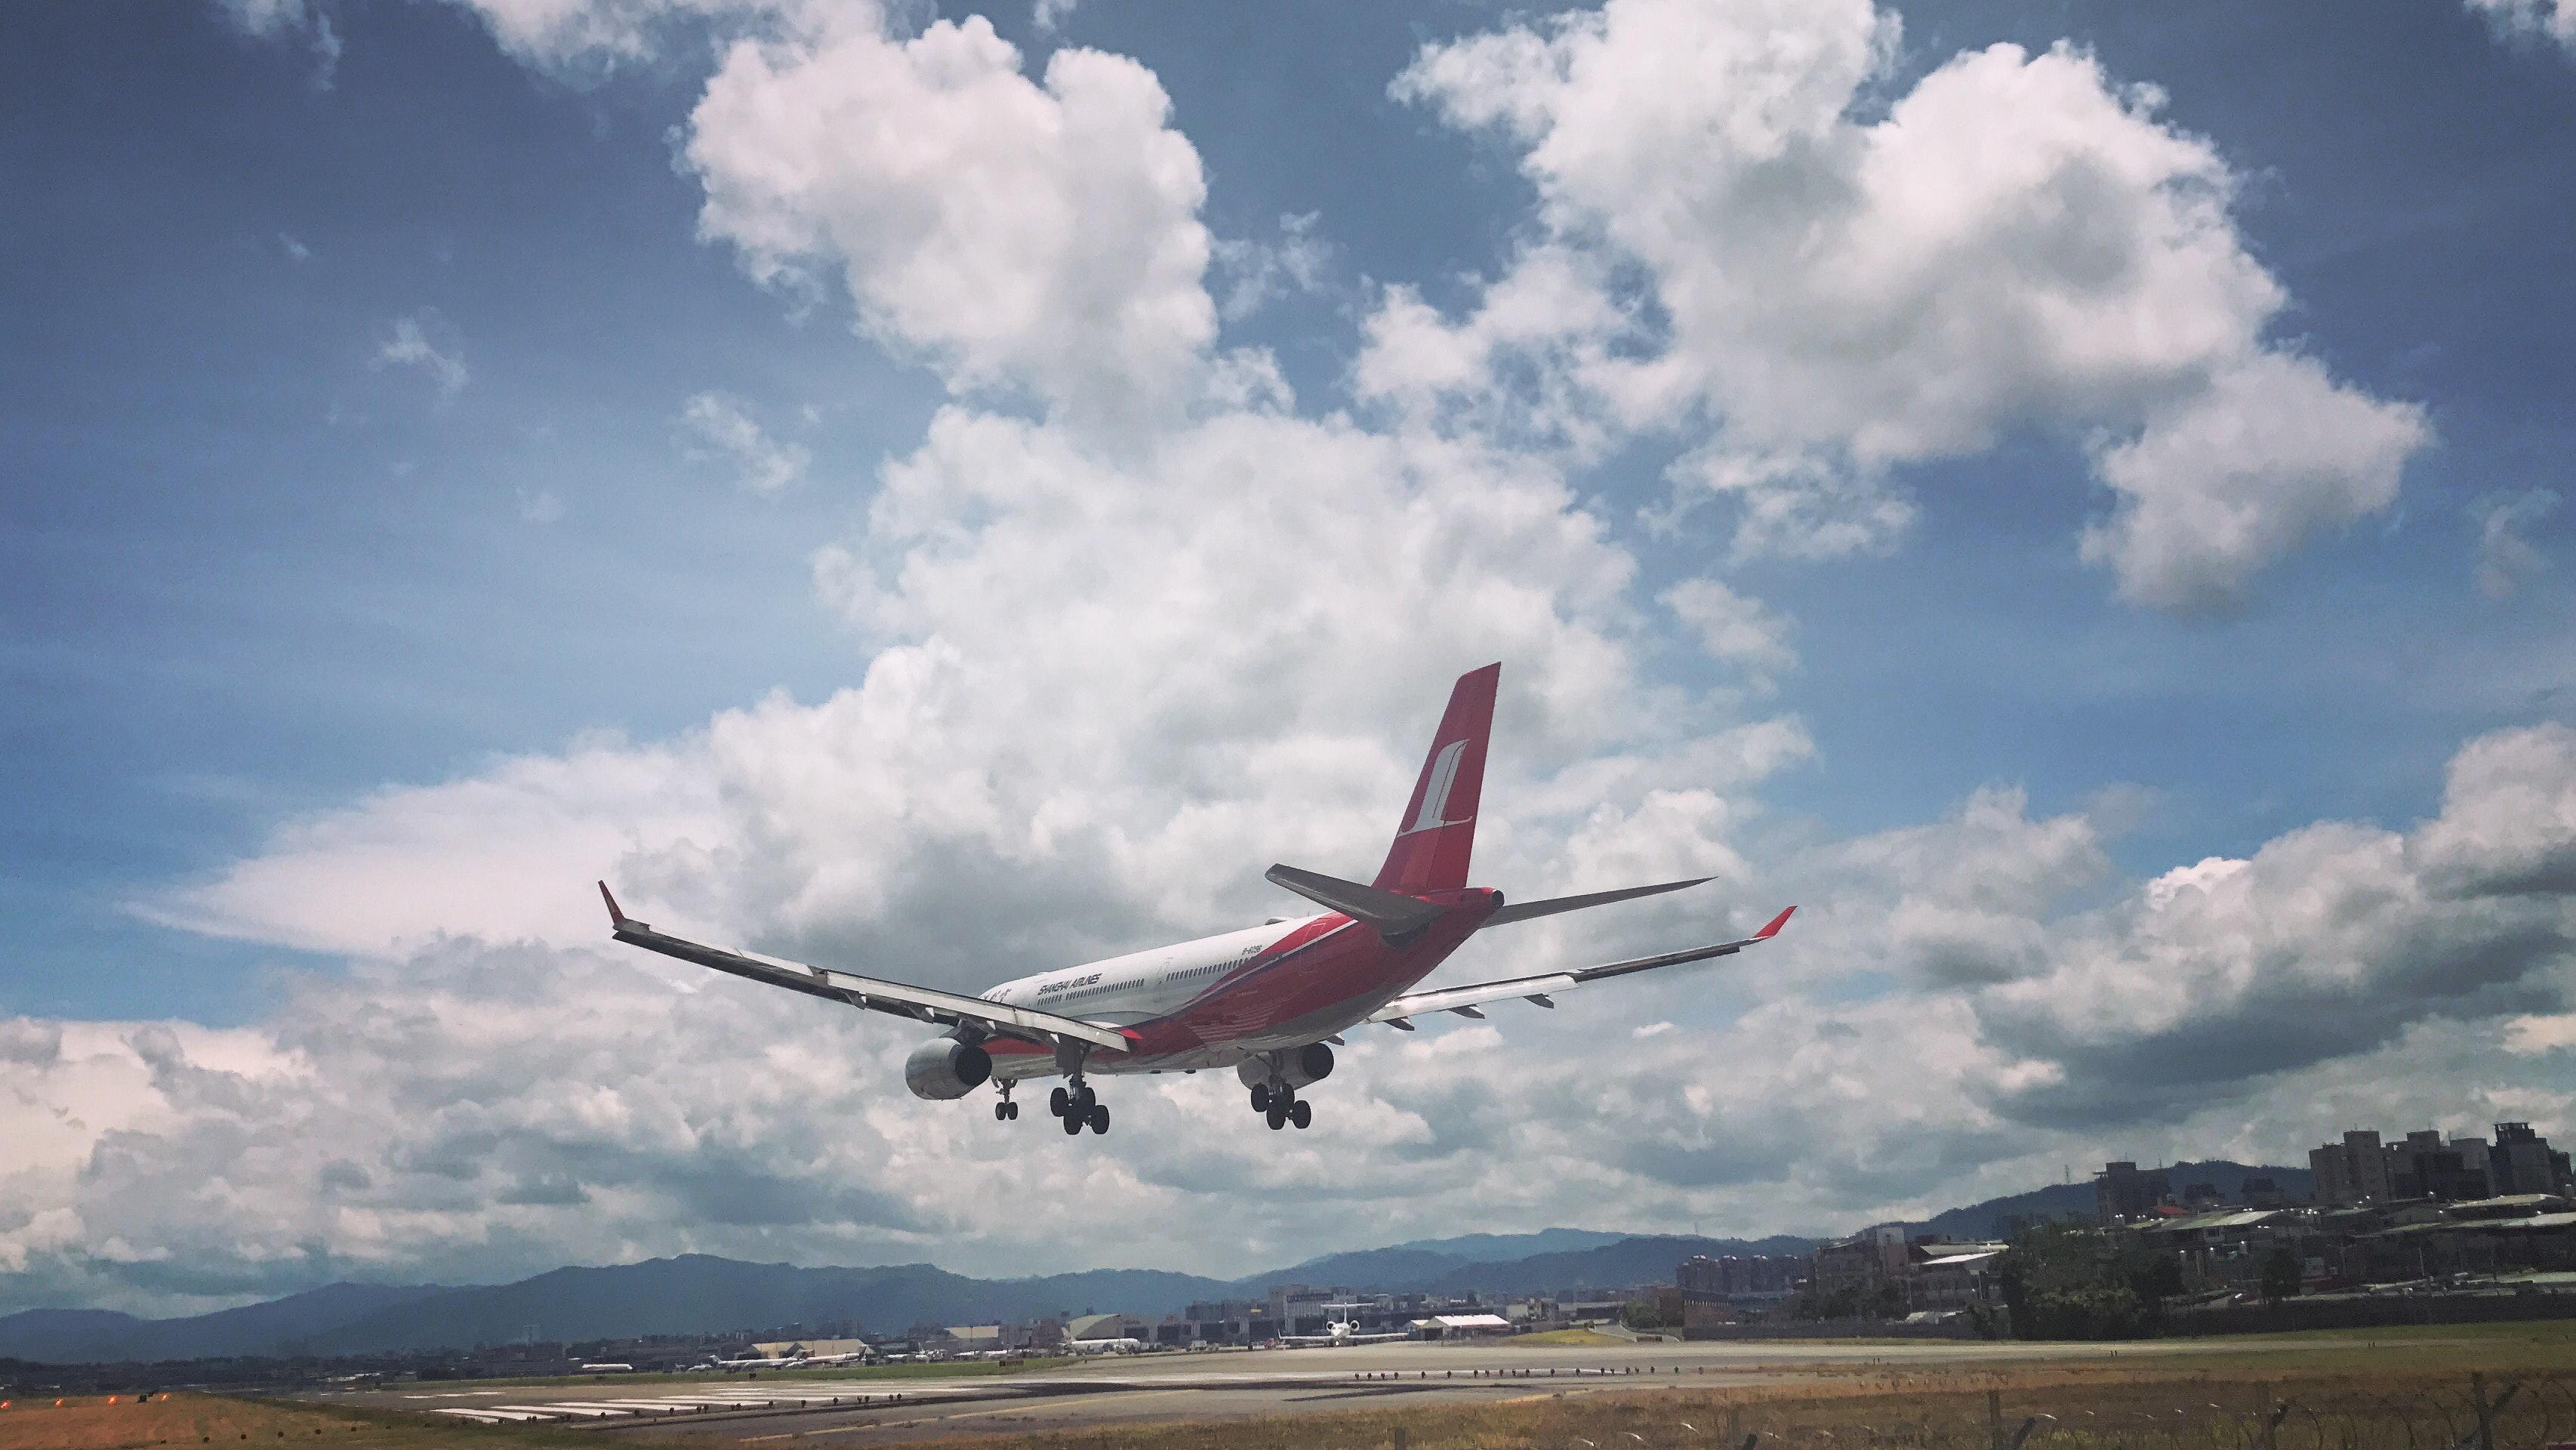 Performance de aeronaves a jato: Pouso